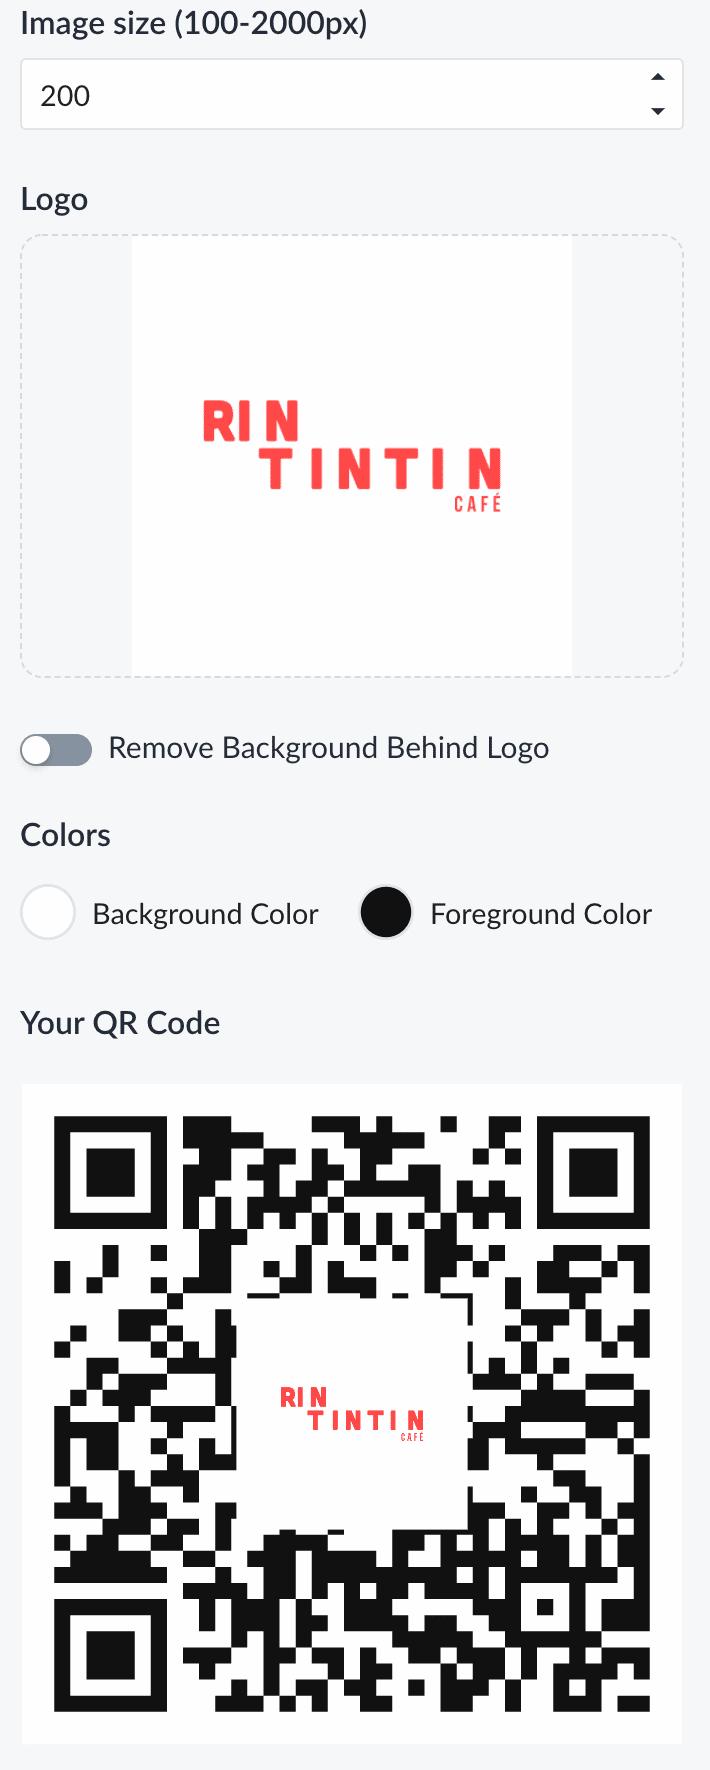 Customizing QR Code